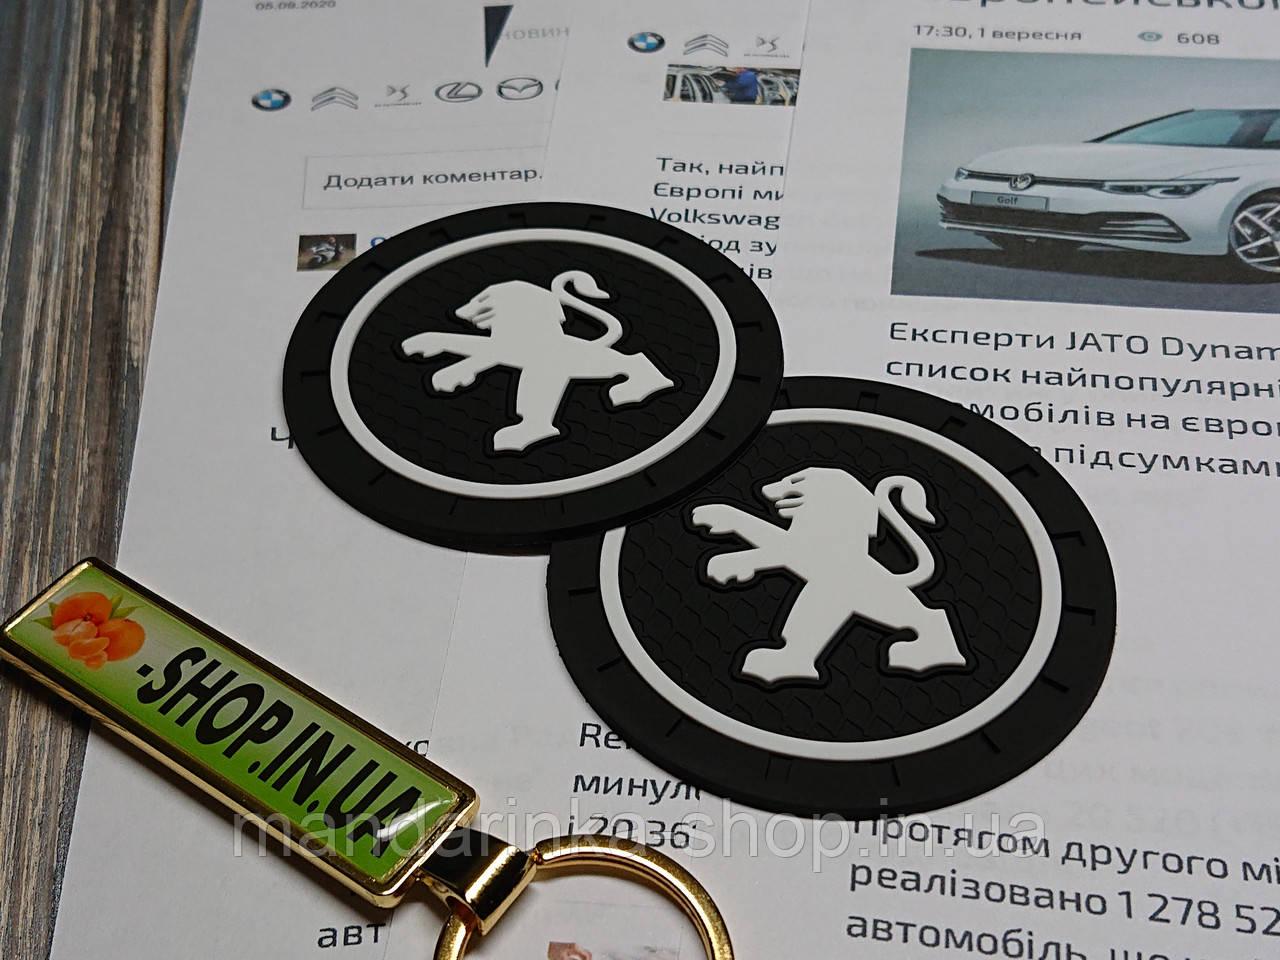 Антиковзаючий килимок в підстаканики Peugeot (Пежо)